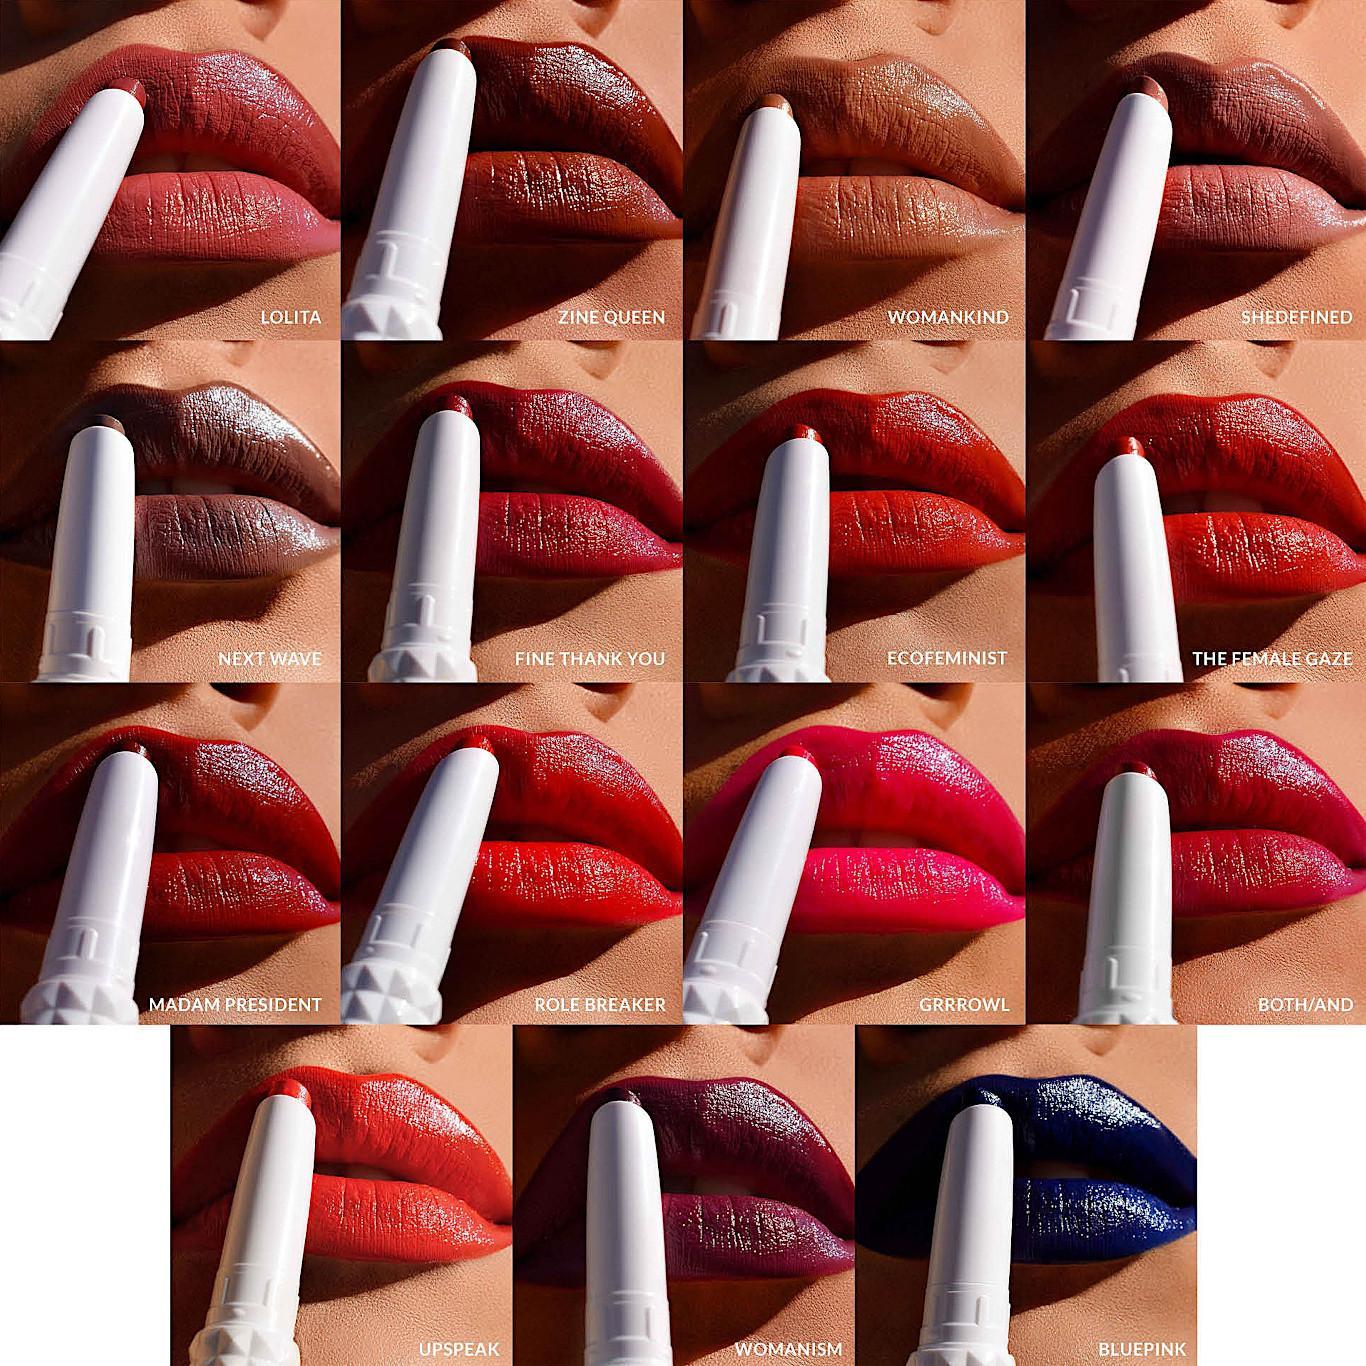 KVD Beauty Epic Kiss Nourishing Vegan Butter Lipstick Lip Swatches Collage Light